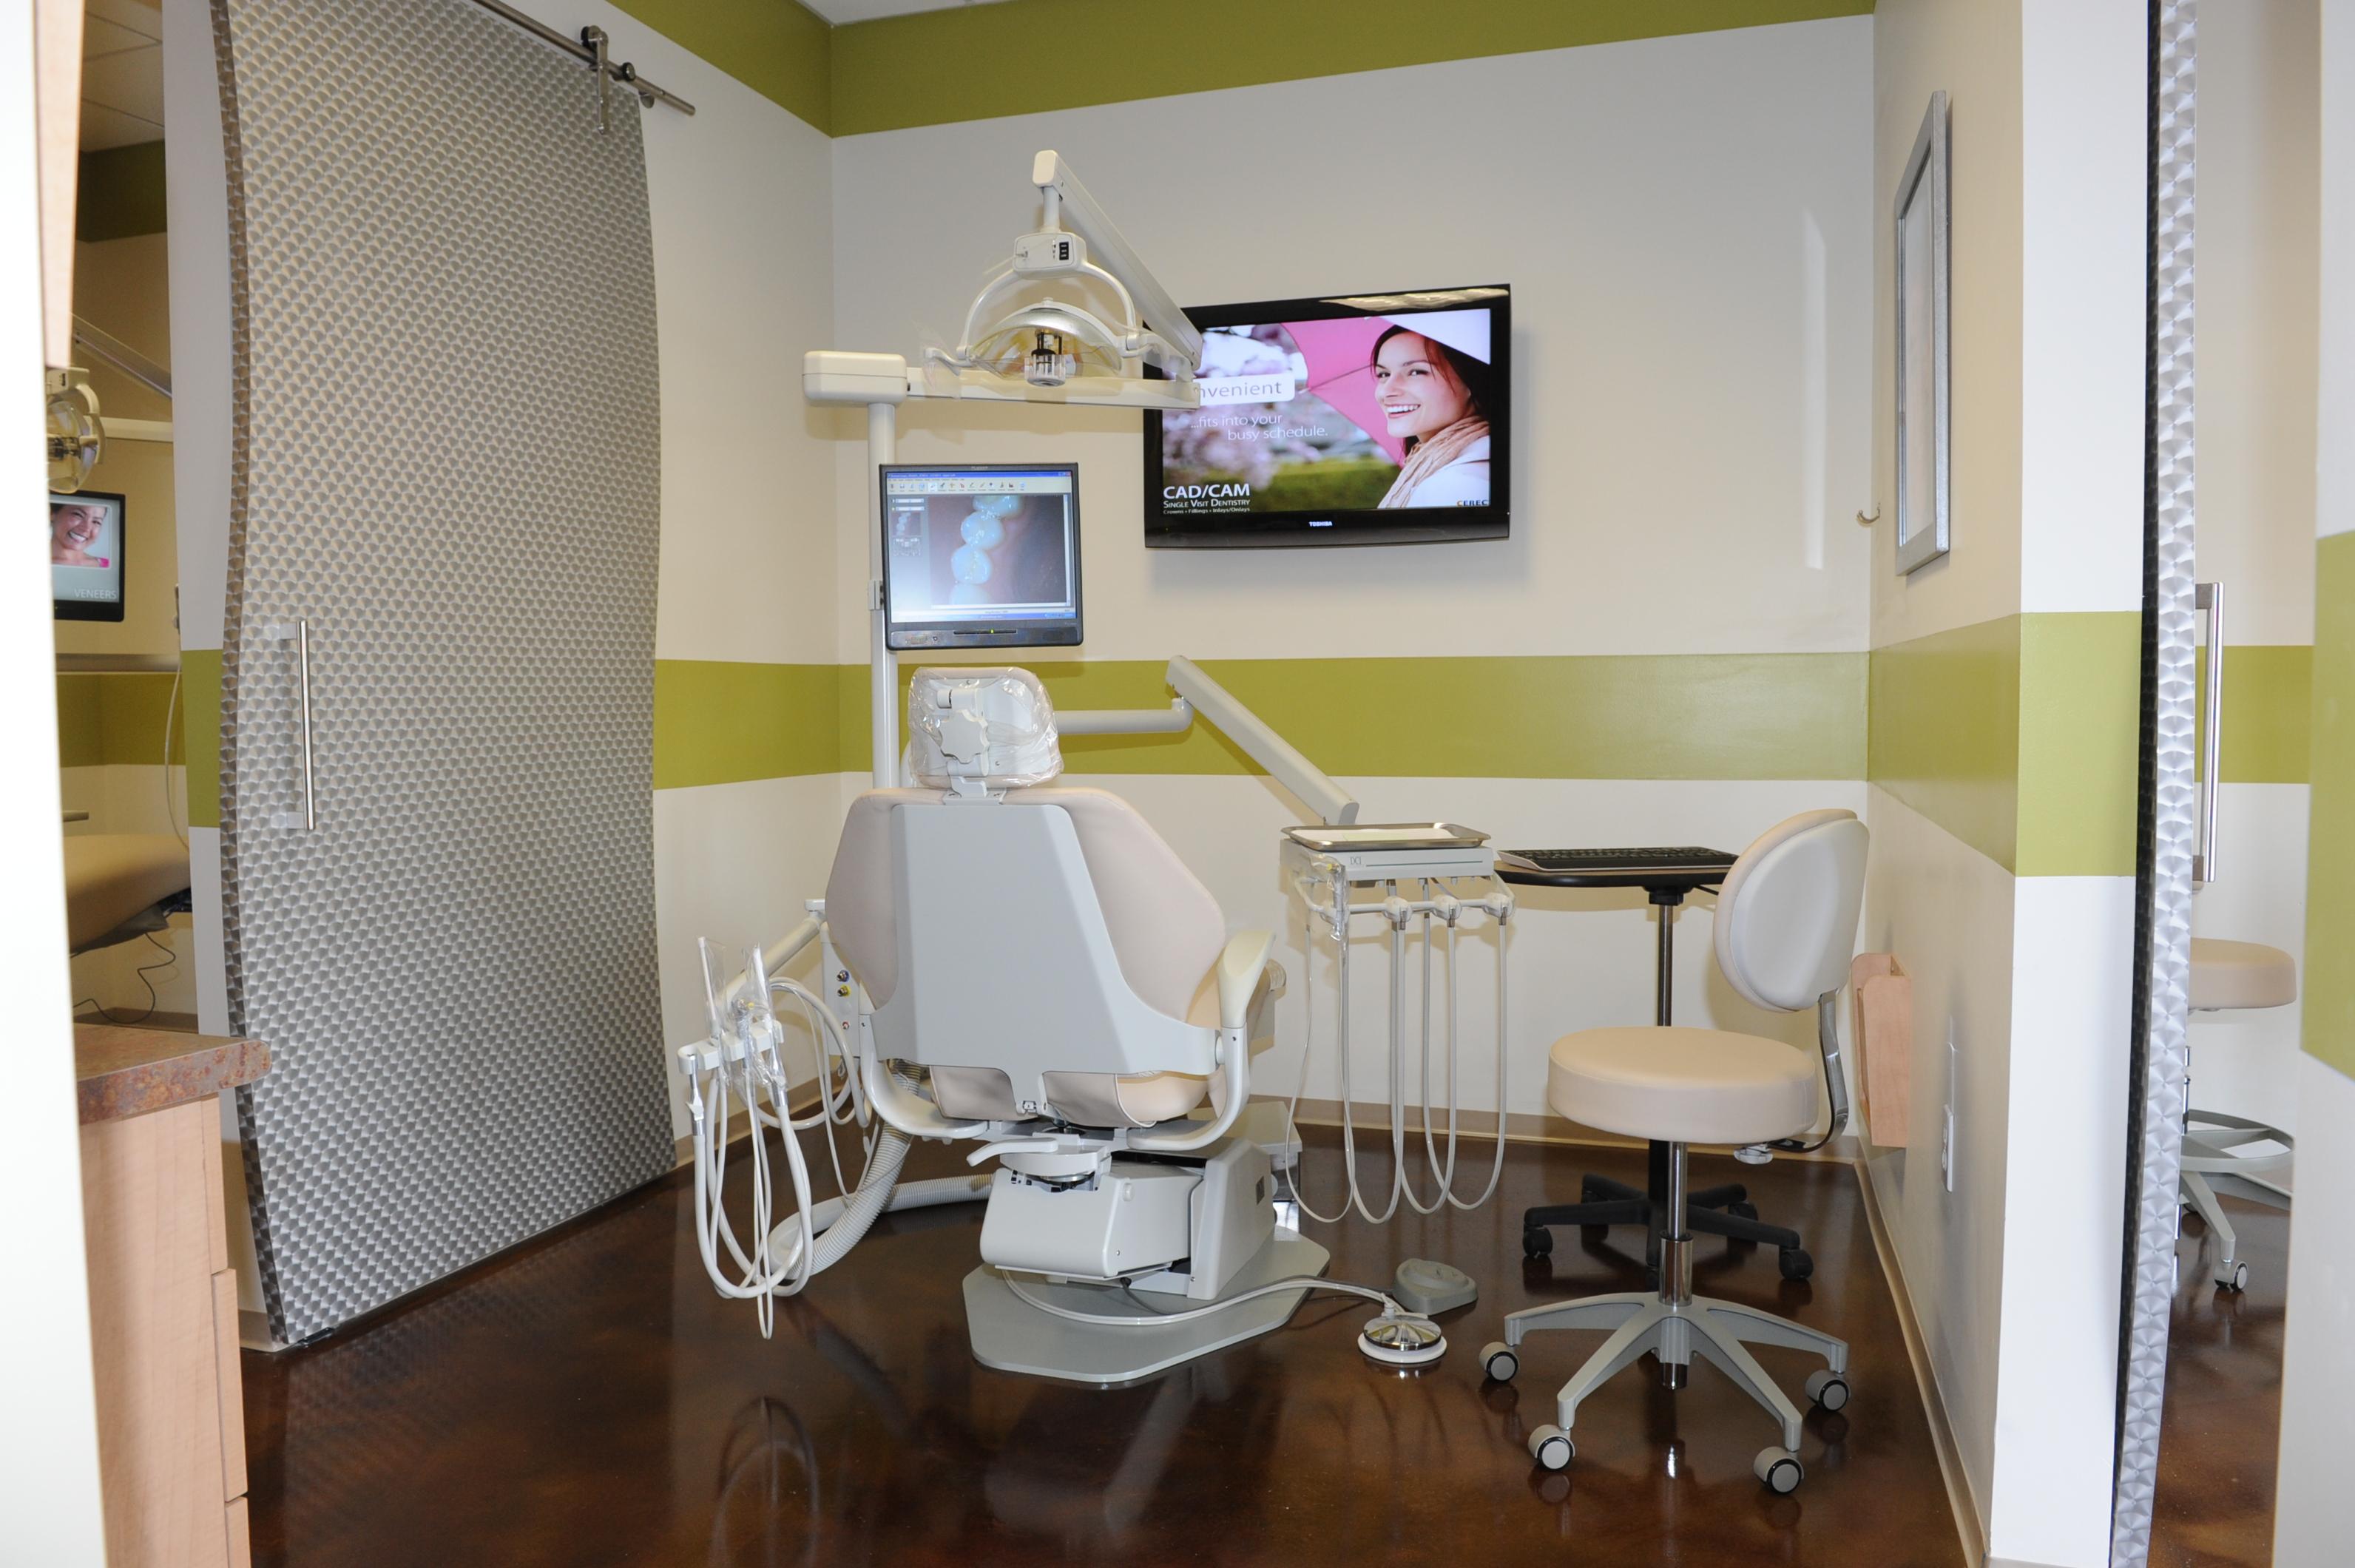 RSD Dental Group and Orthodontics image 5